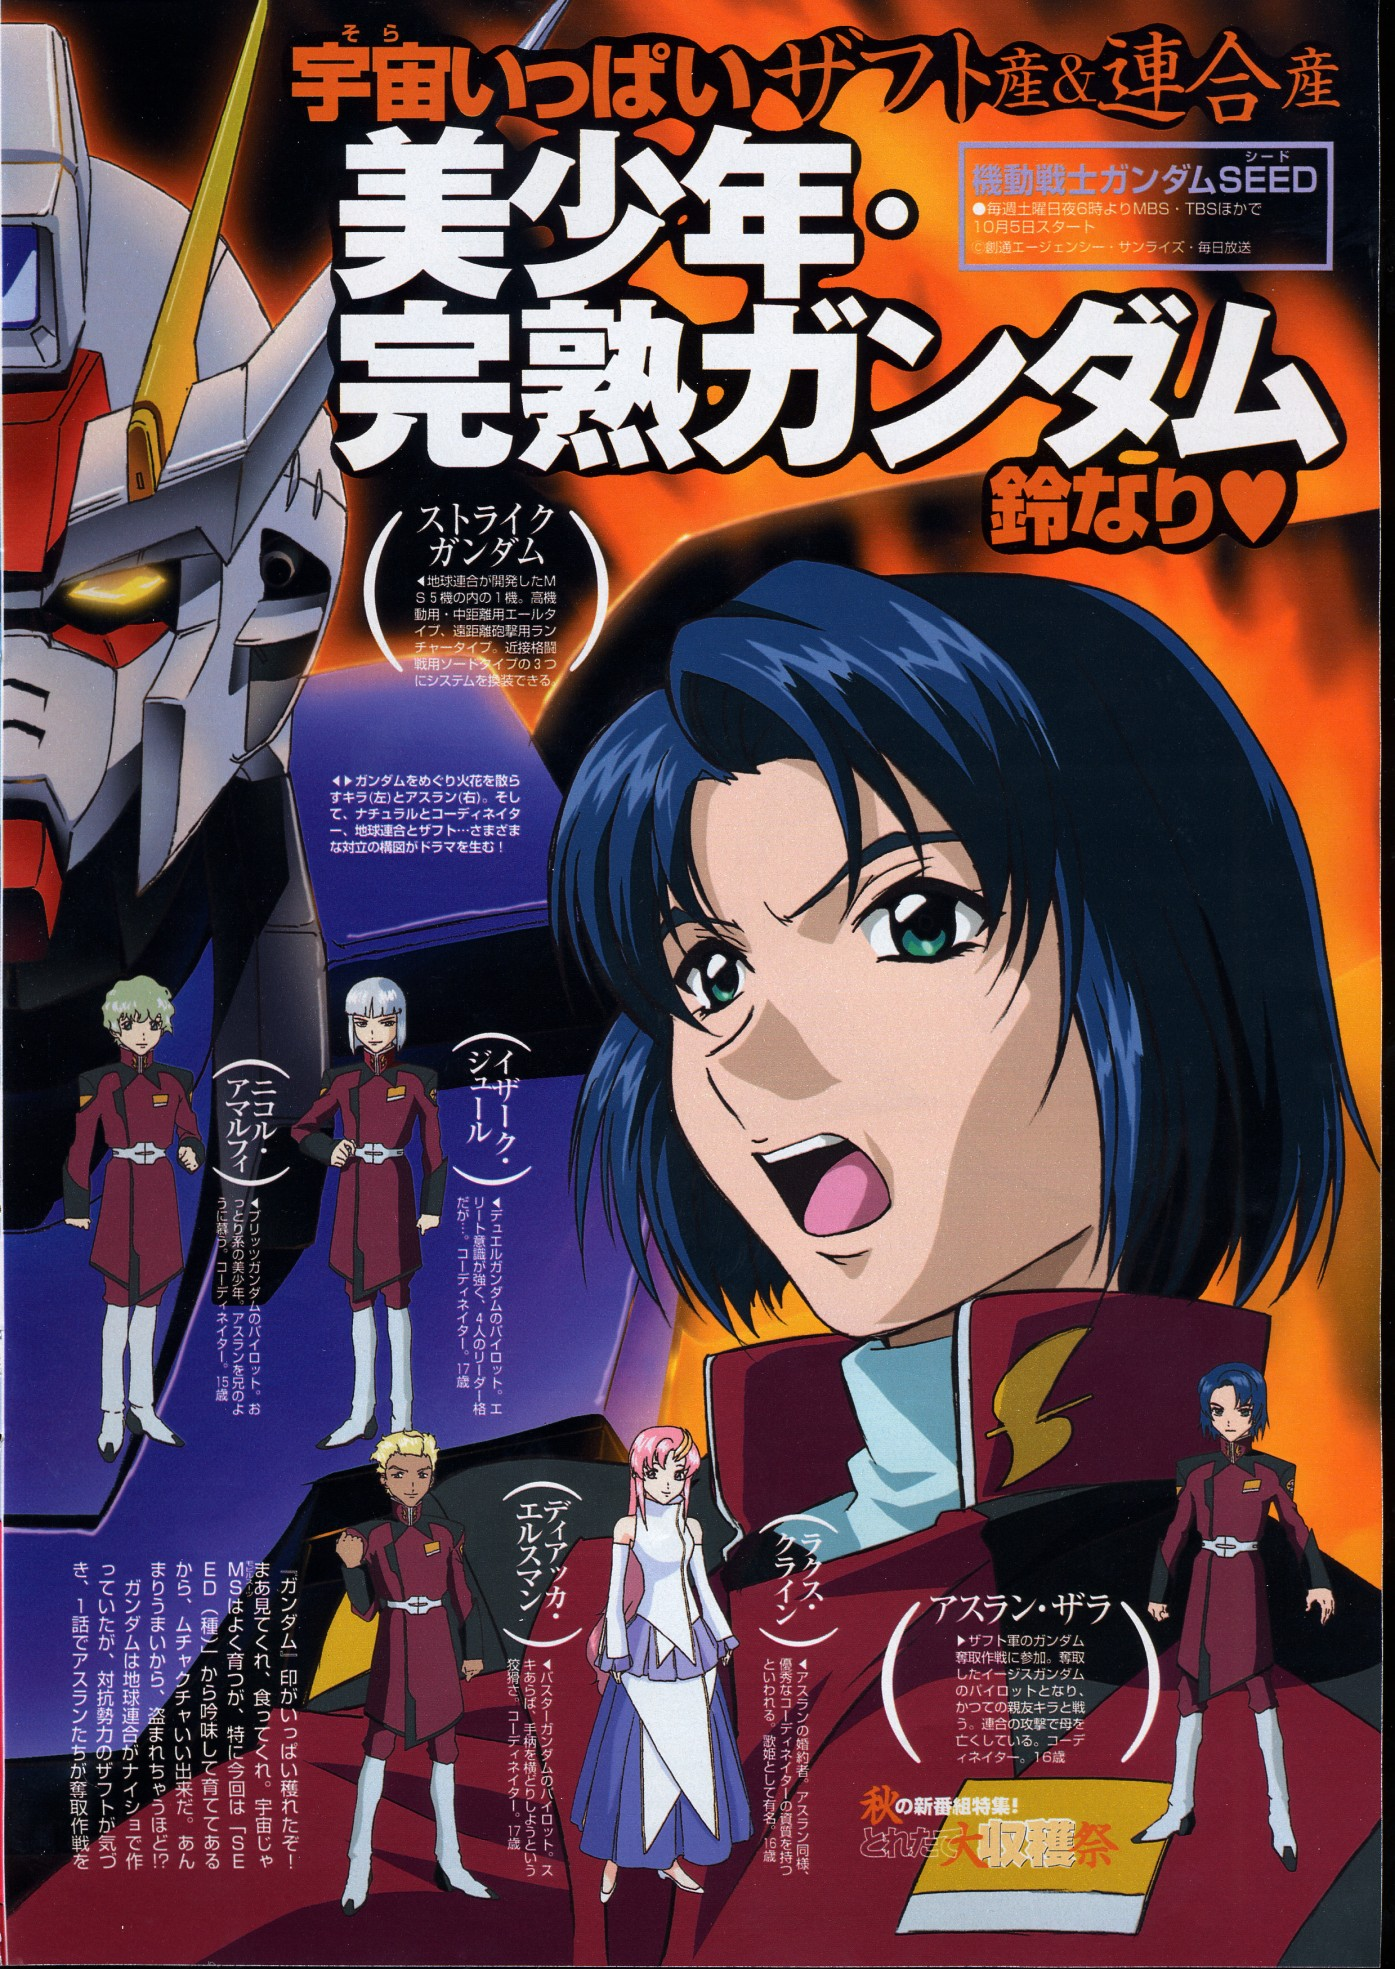 Streaming Gundam Seed Sub Indo : streaming, gundam, Download, Anime, Mobile, Gundam, Destiny, Watertronics